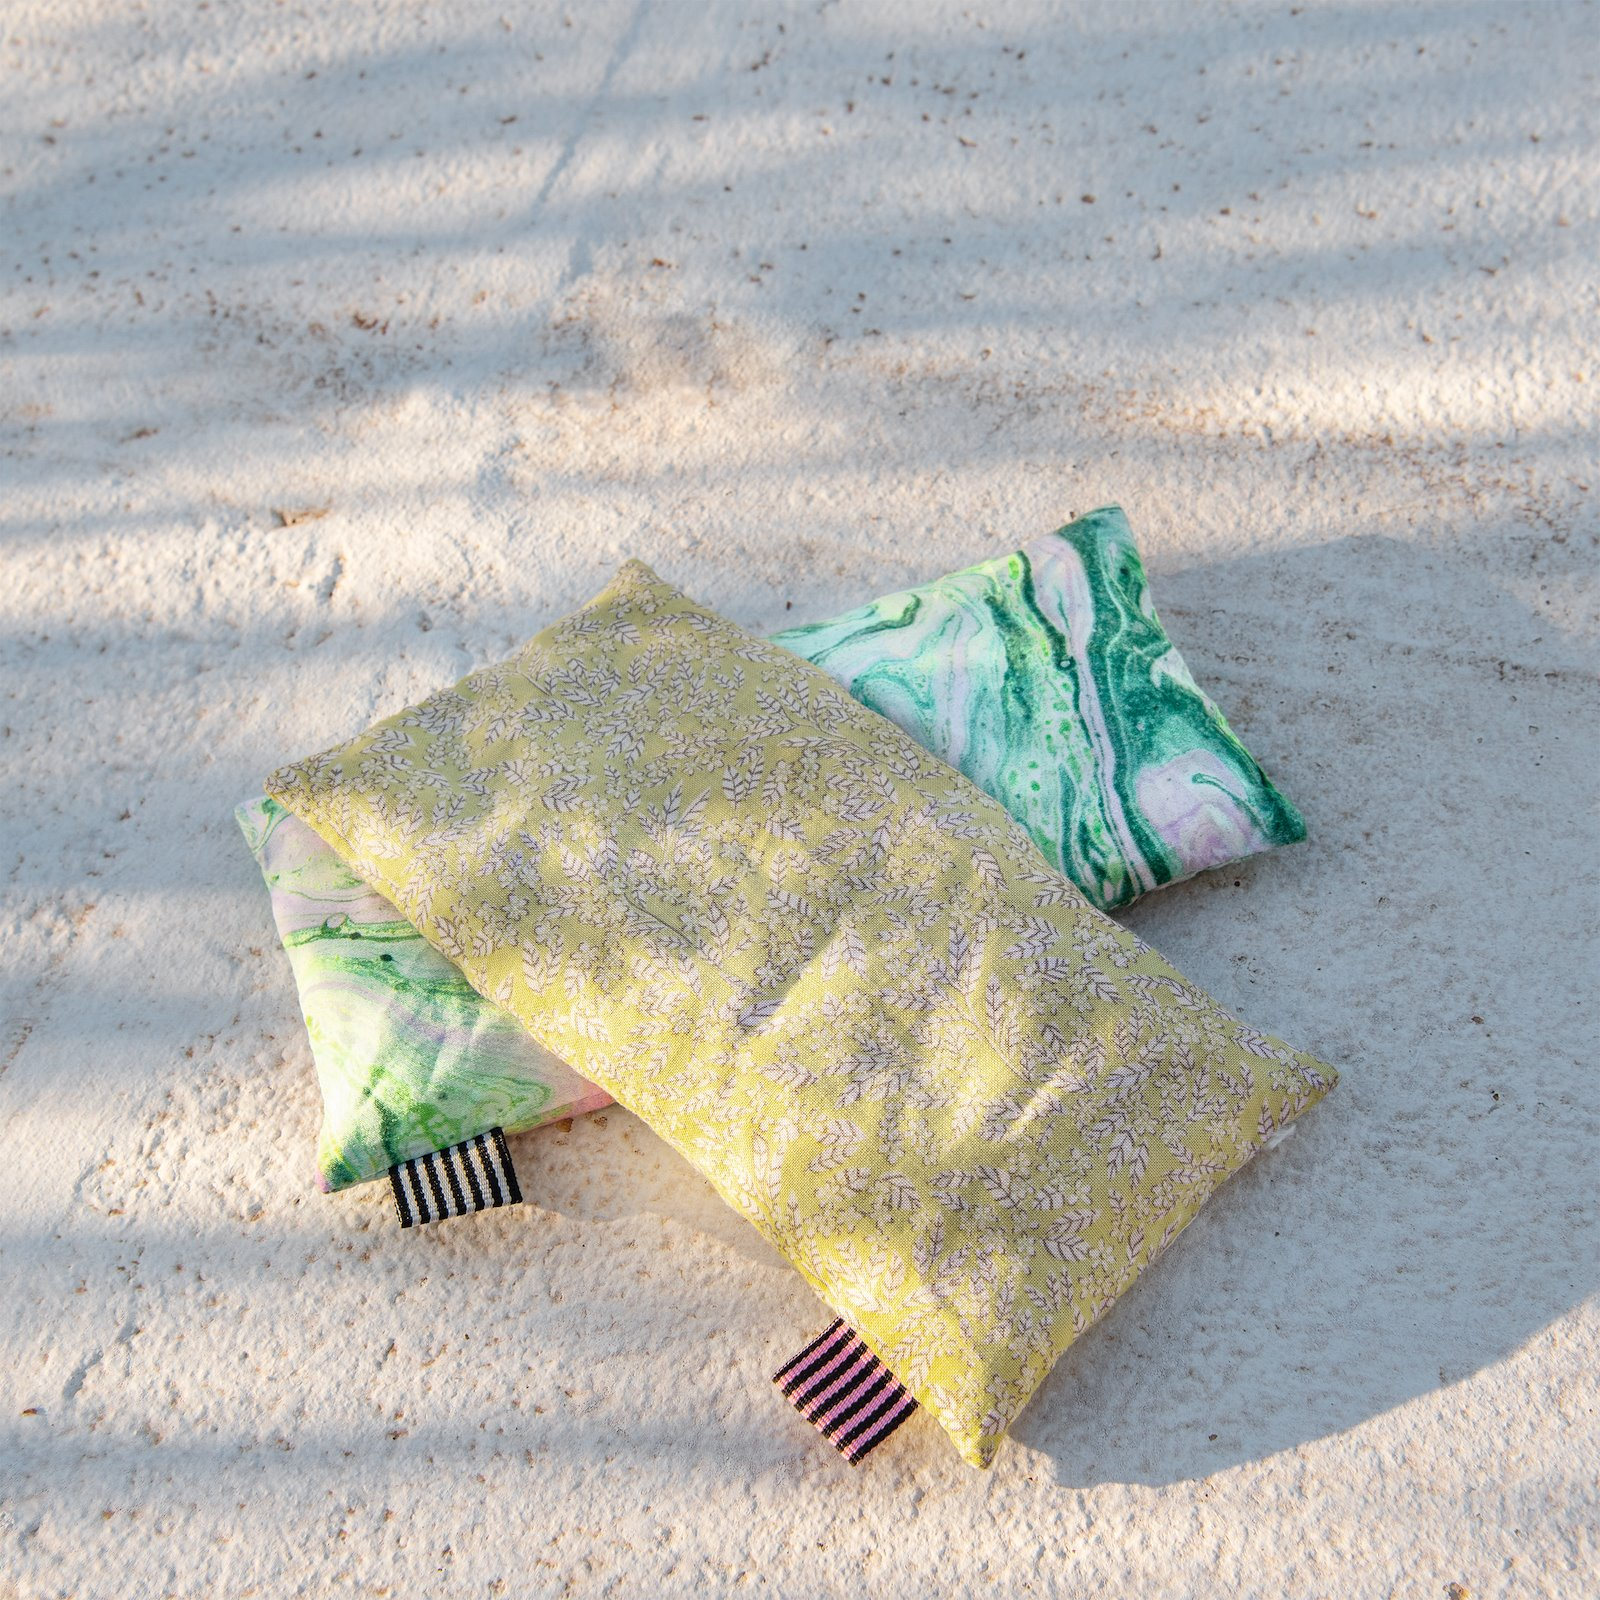 Lavender dried 100g/0,85 liter 852368_540115_21470_21330_39097_39098_bundle